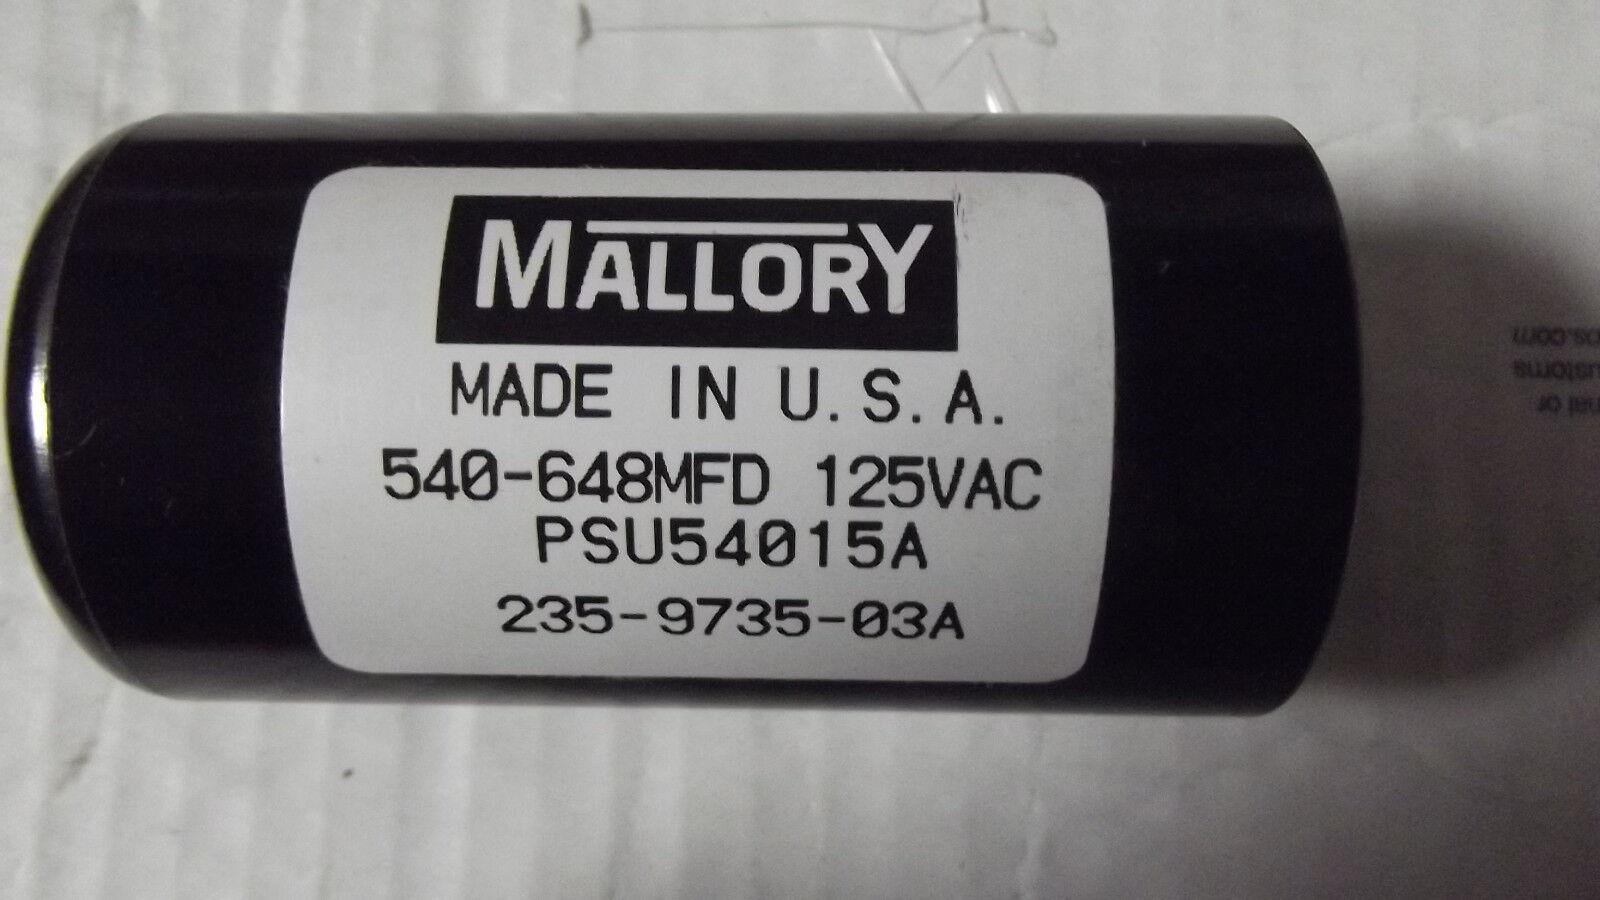 2MALLORY 540-648MFD 125VAC CAPACITORS MPSU540 15A  235-9735-03A,MADE IN USA.10.6